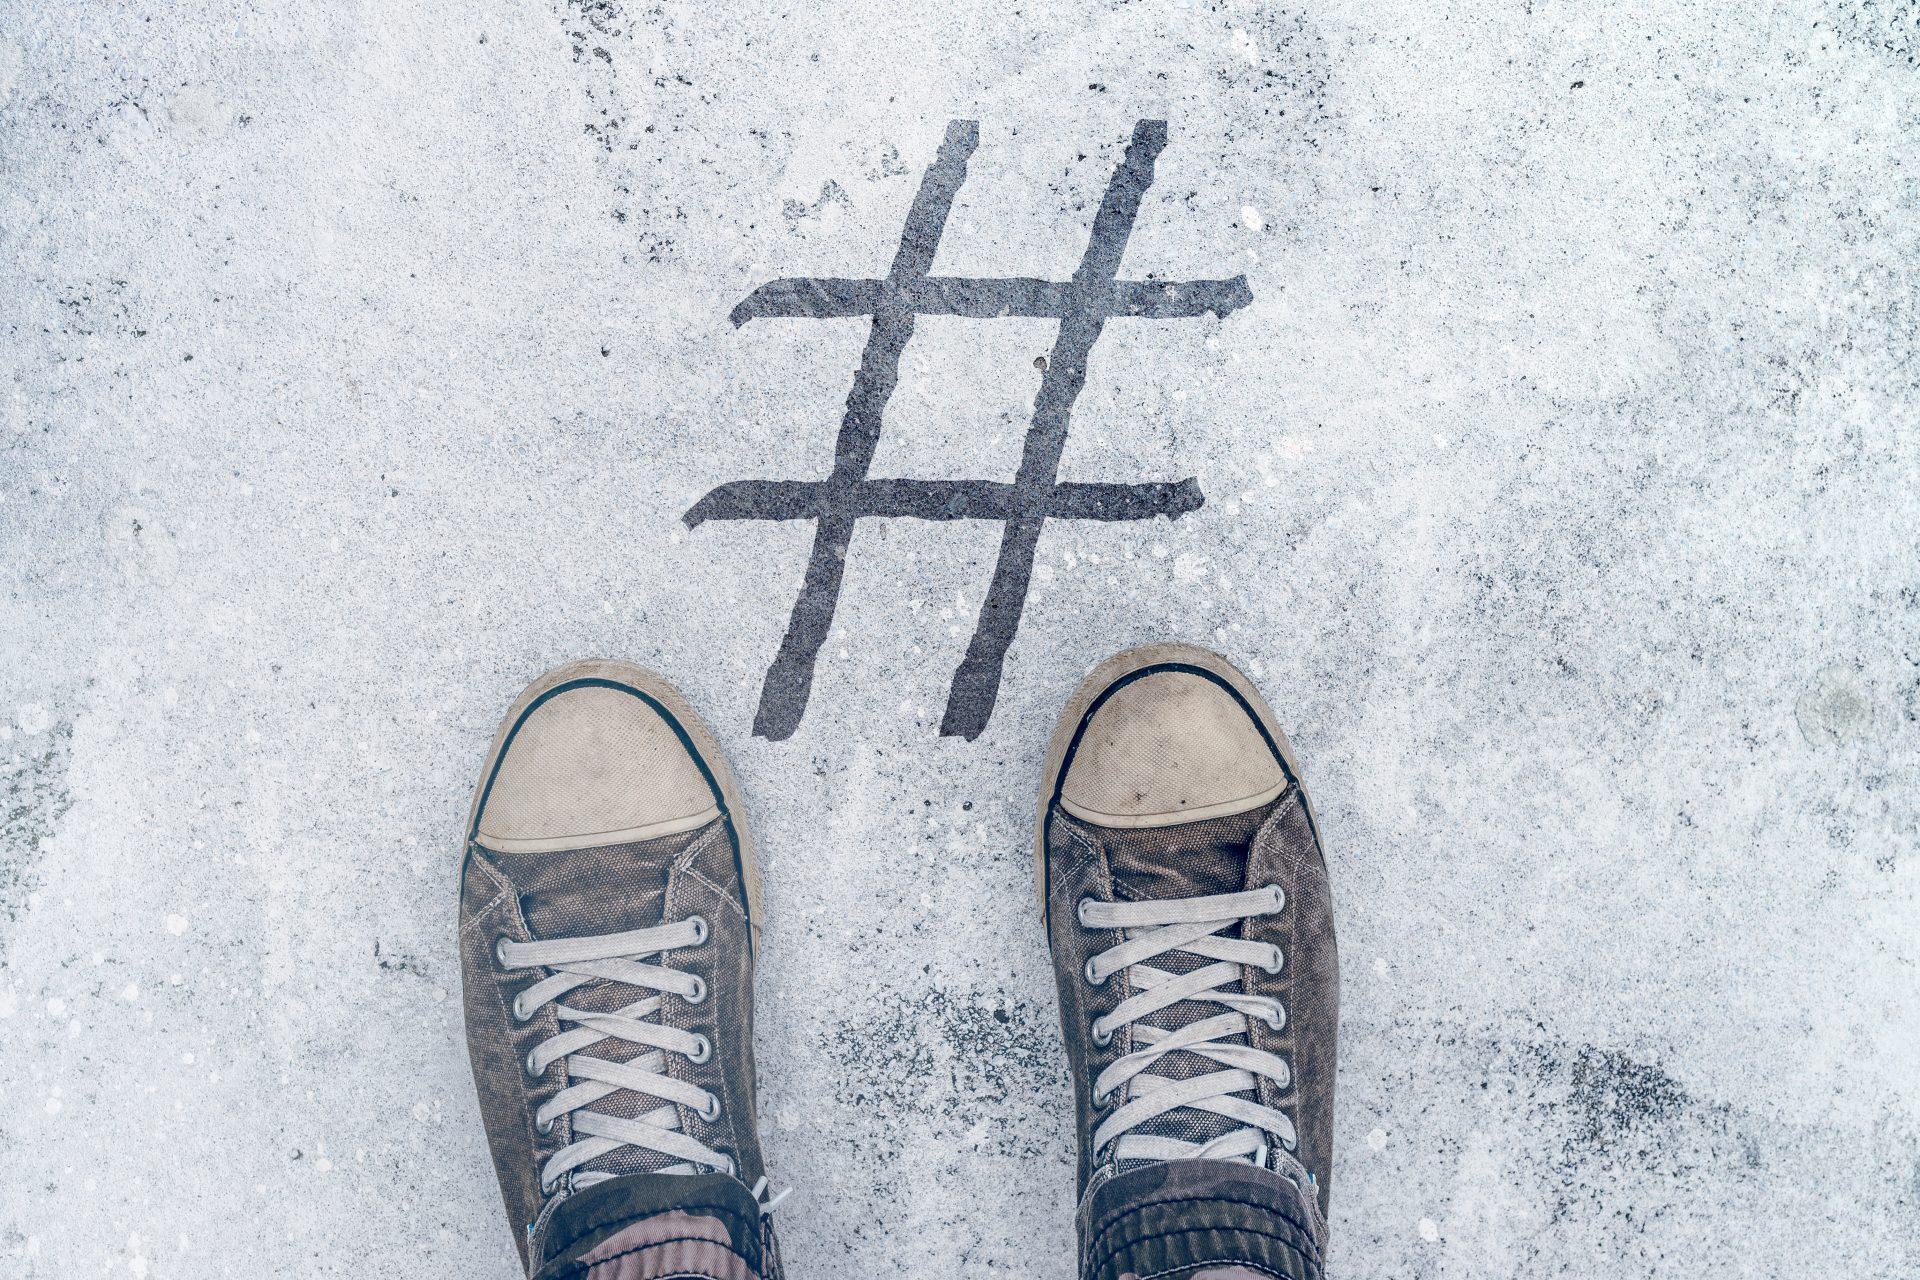 Feet standing over hashtag imprint on street